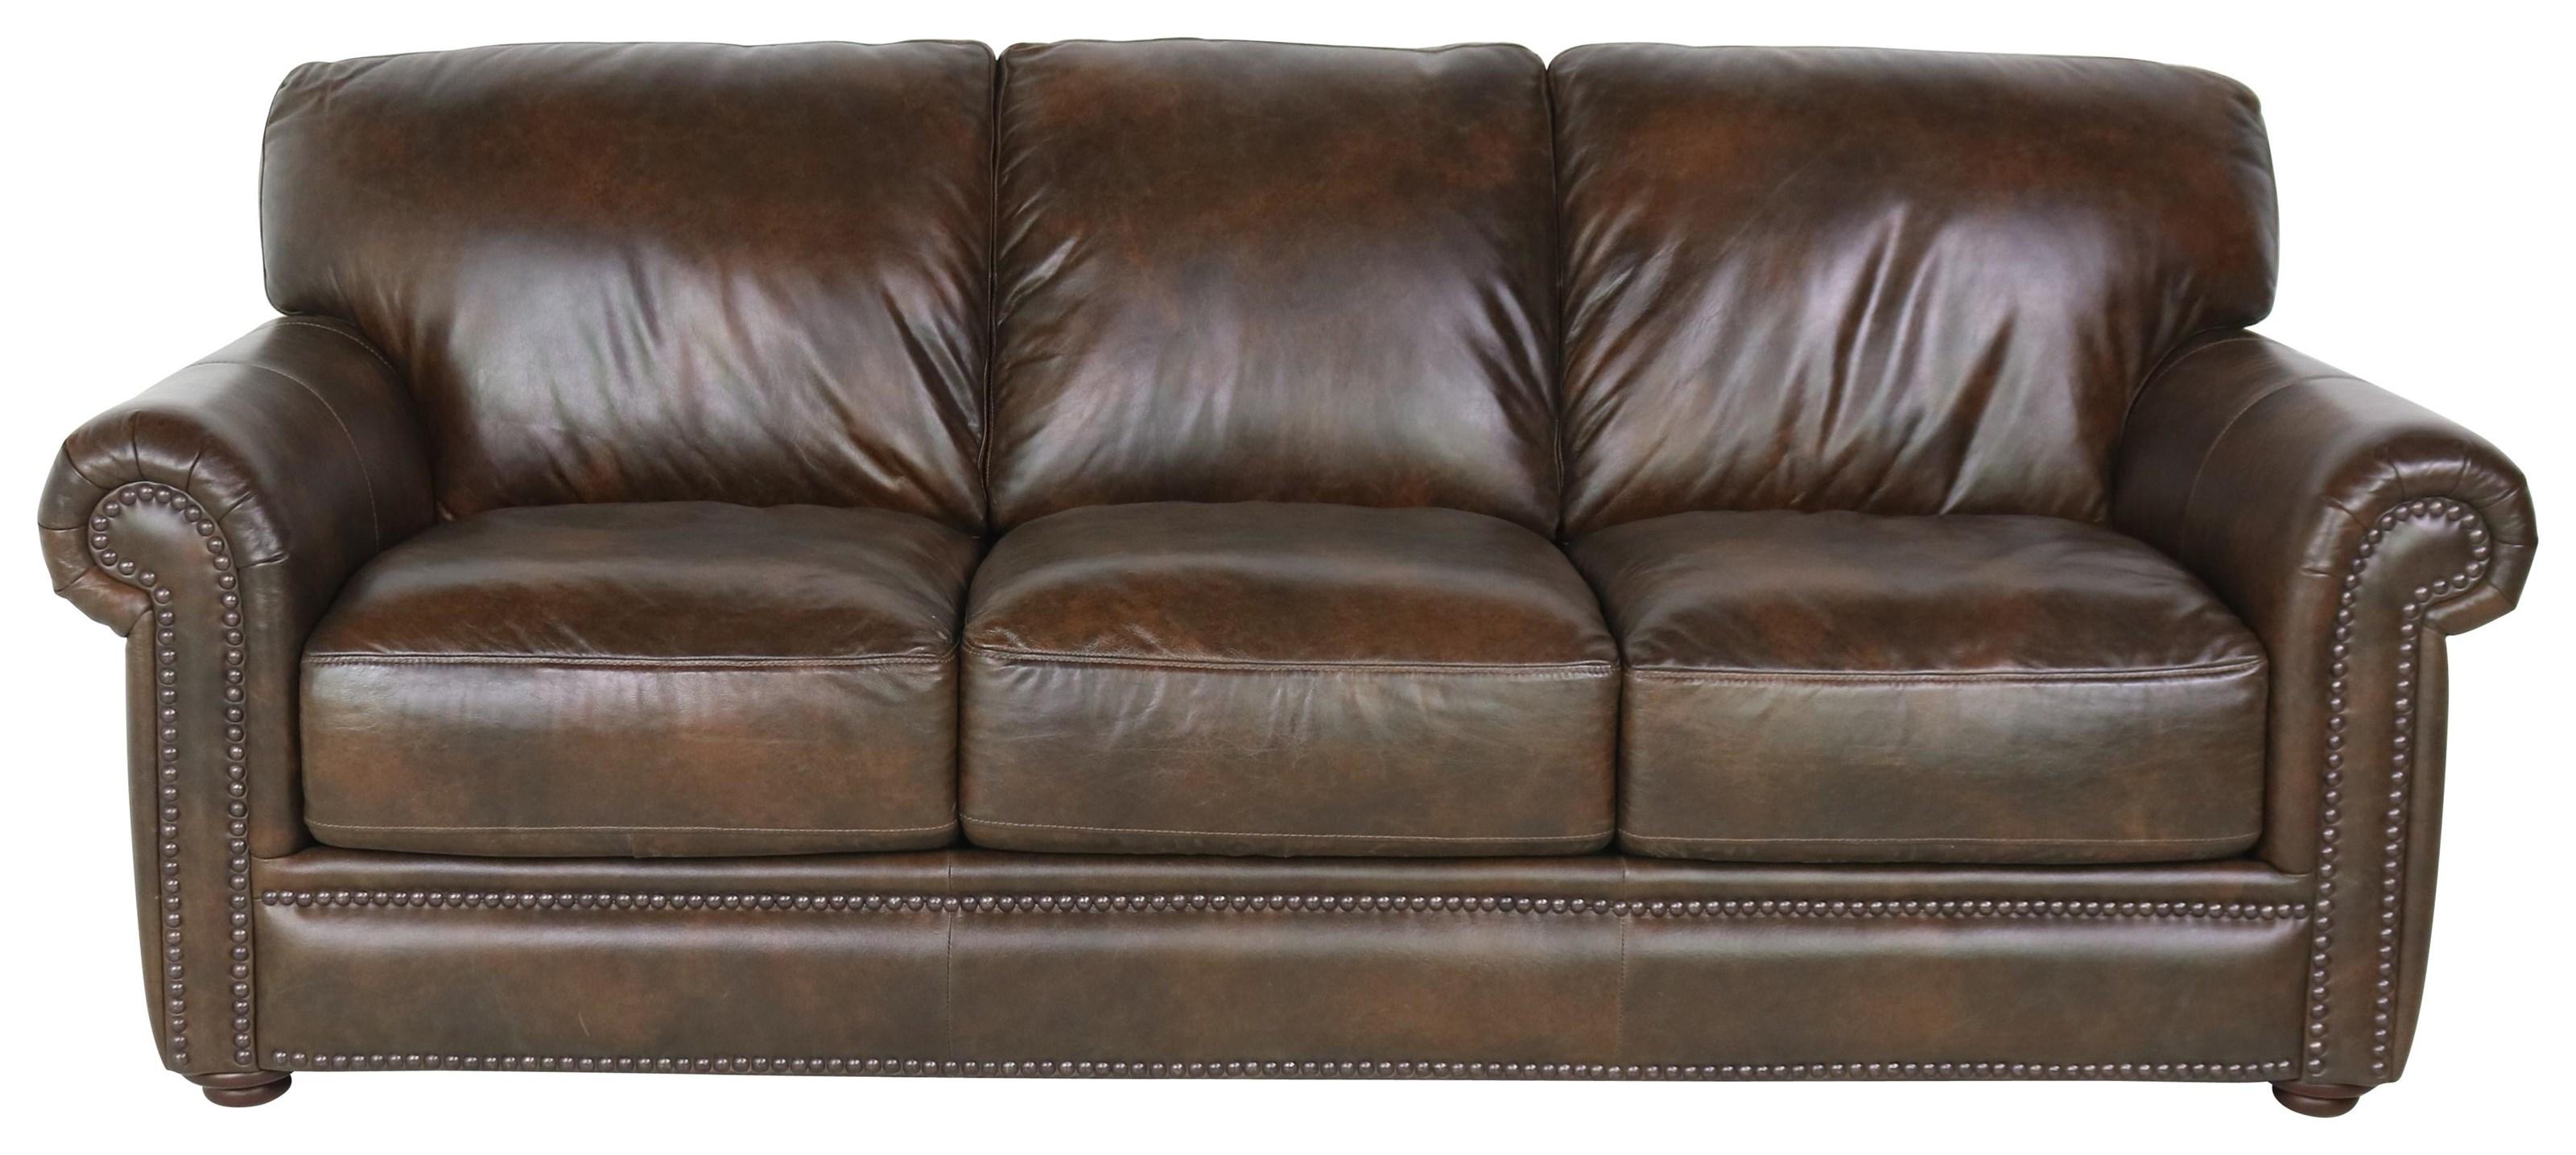 Sprintz Dante Leather Sofa by Dante Leather at Sprintz Furniture